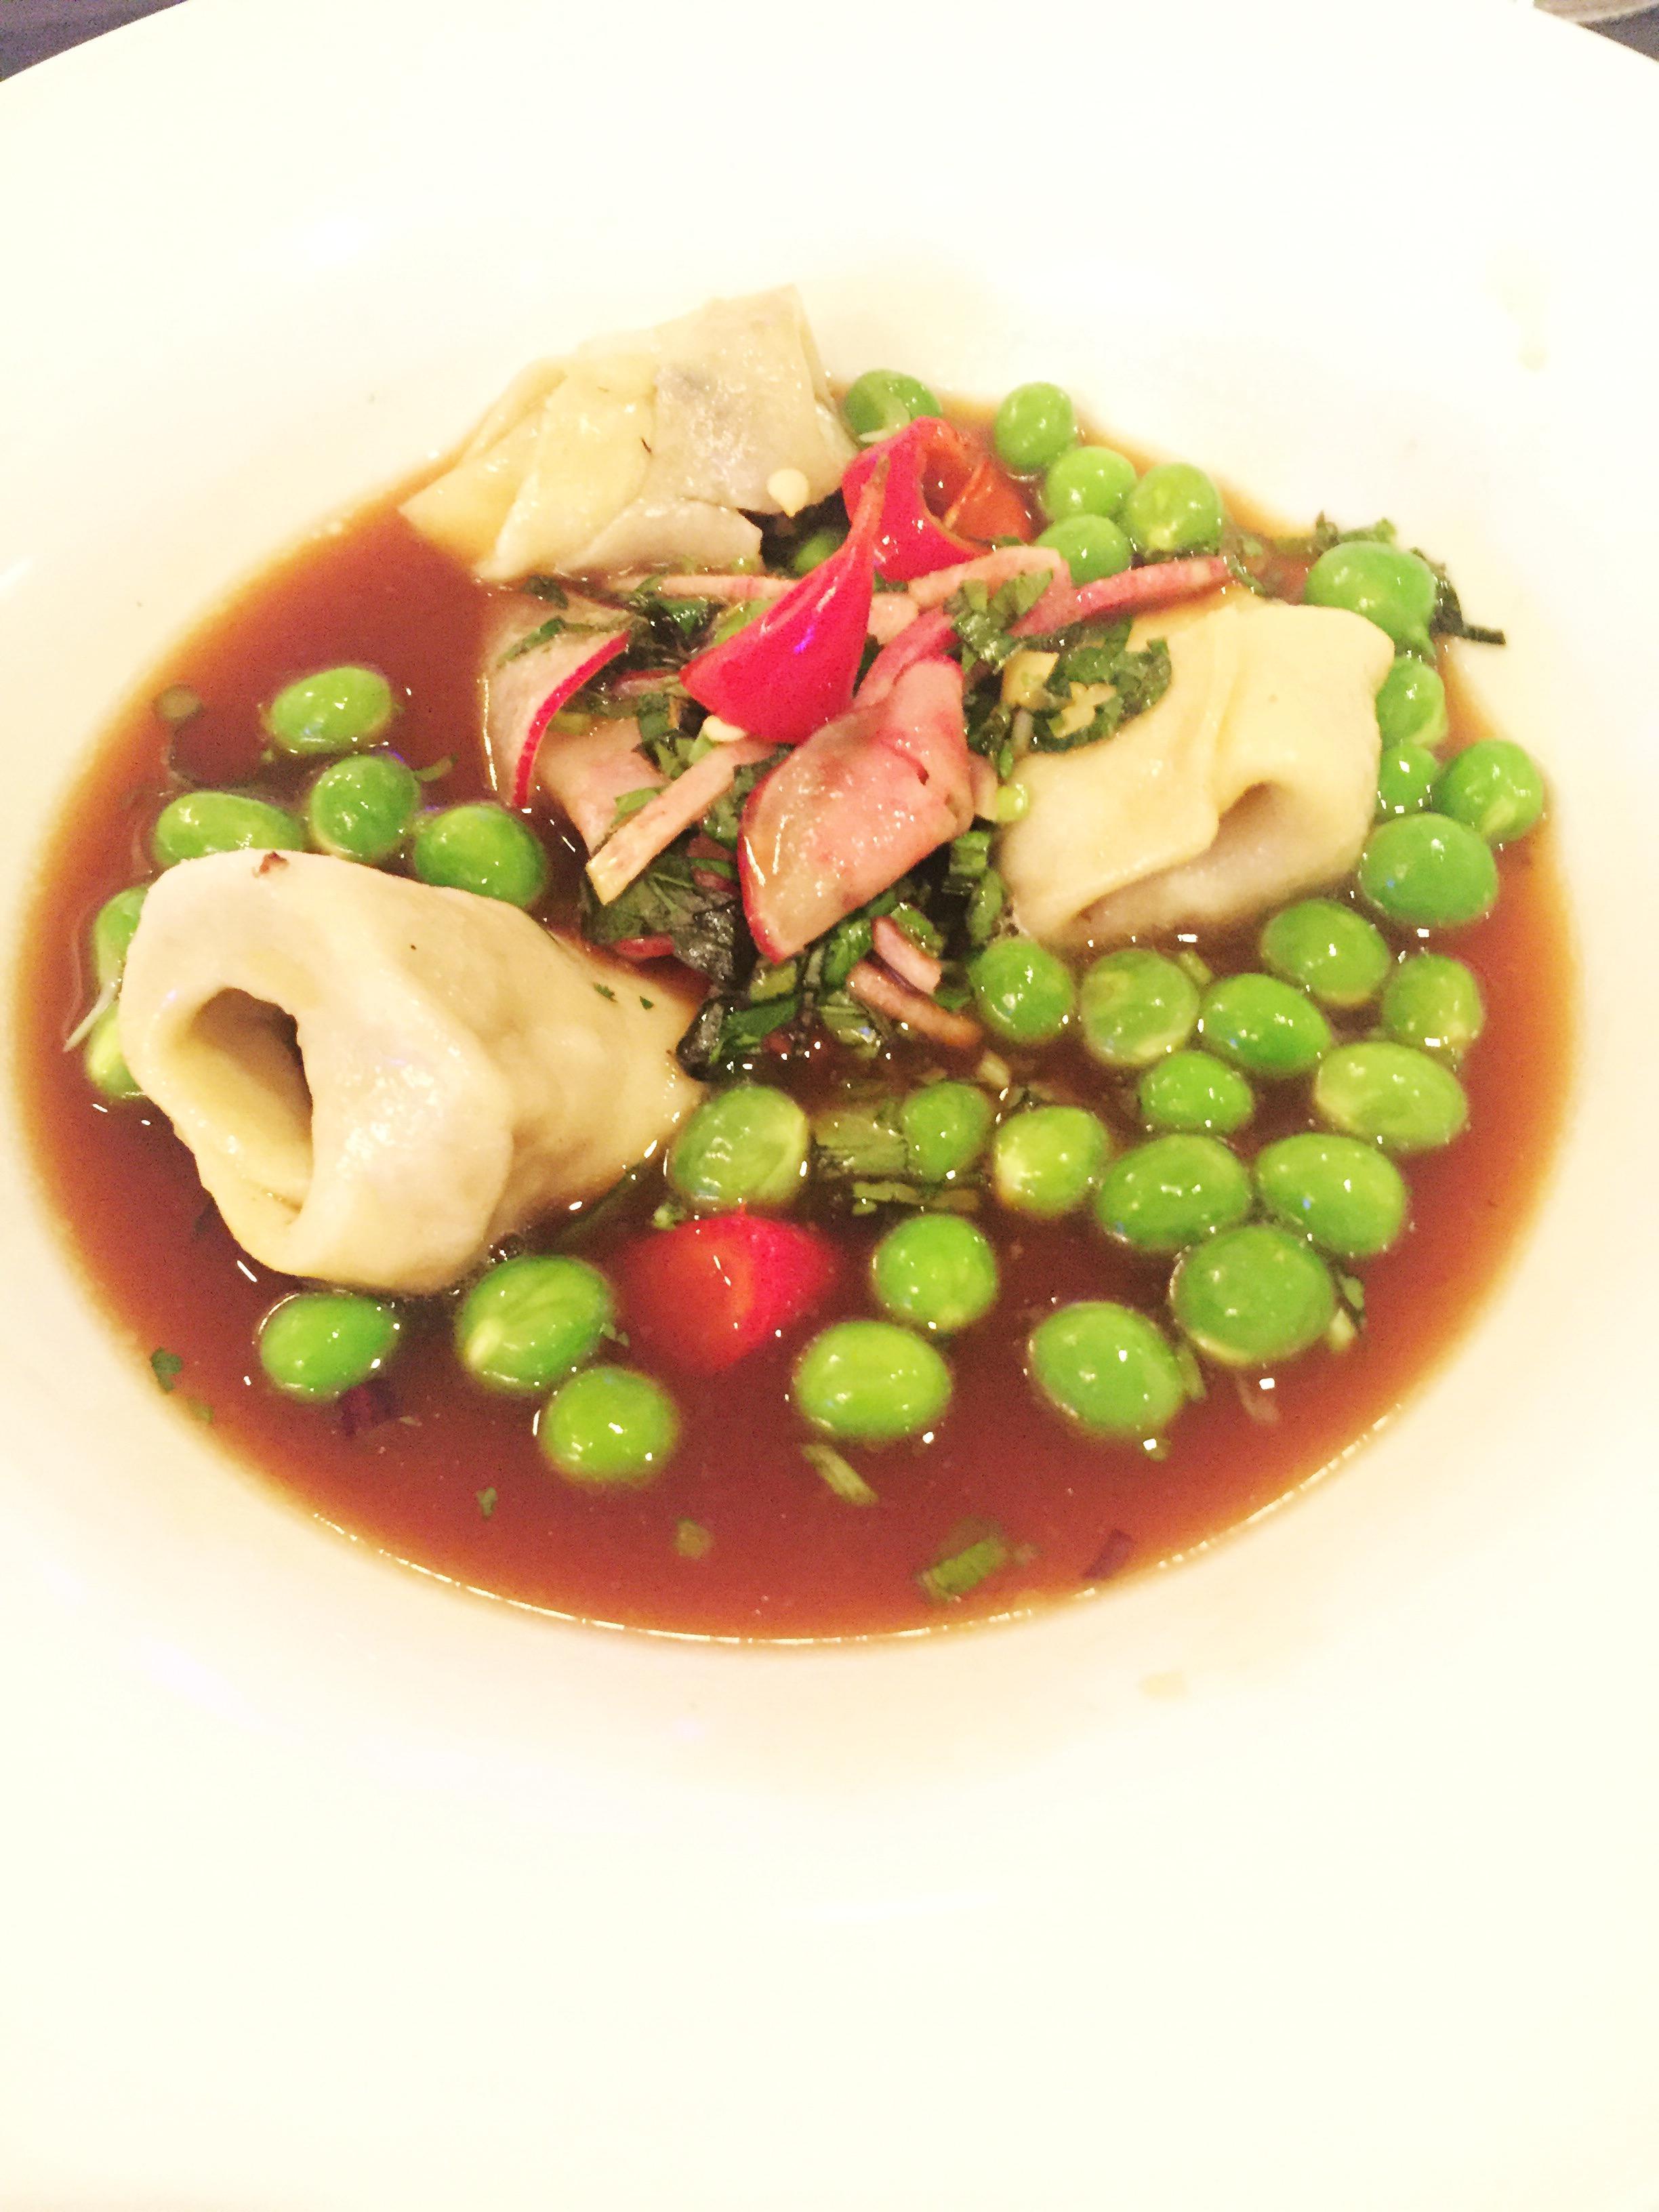 Smoked Mushroom Tortellini (Andy Dombrowski - Zack Buell Restaurants) + 2011 Chateau D'Argadens Rouge